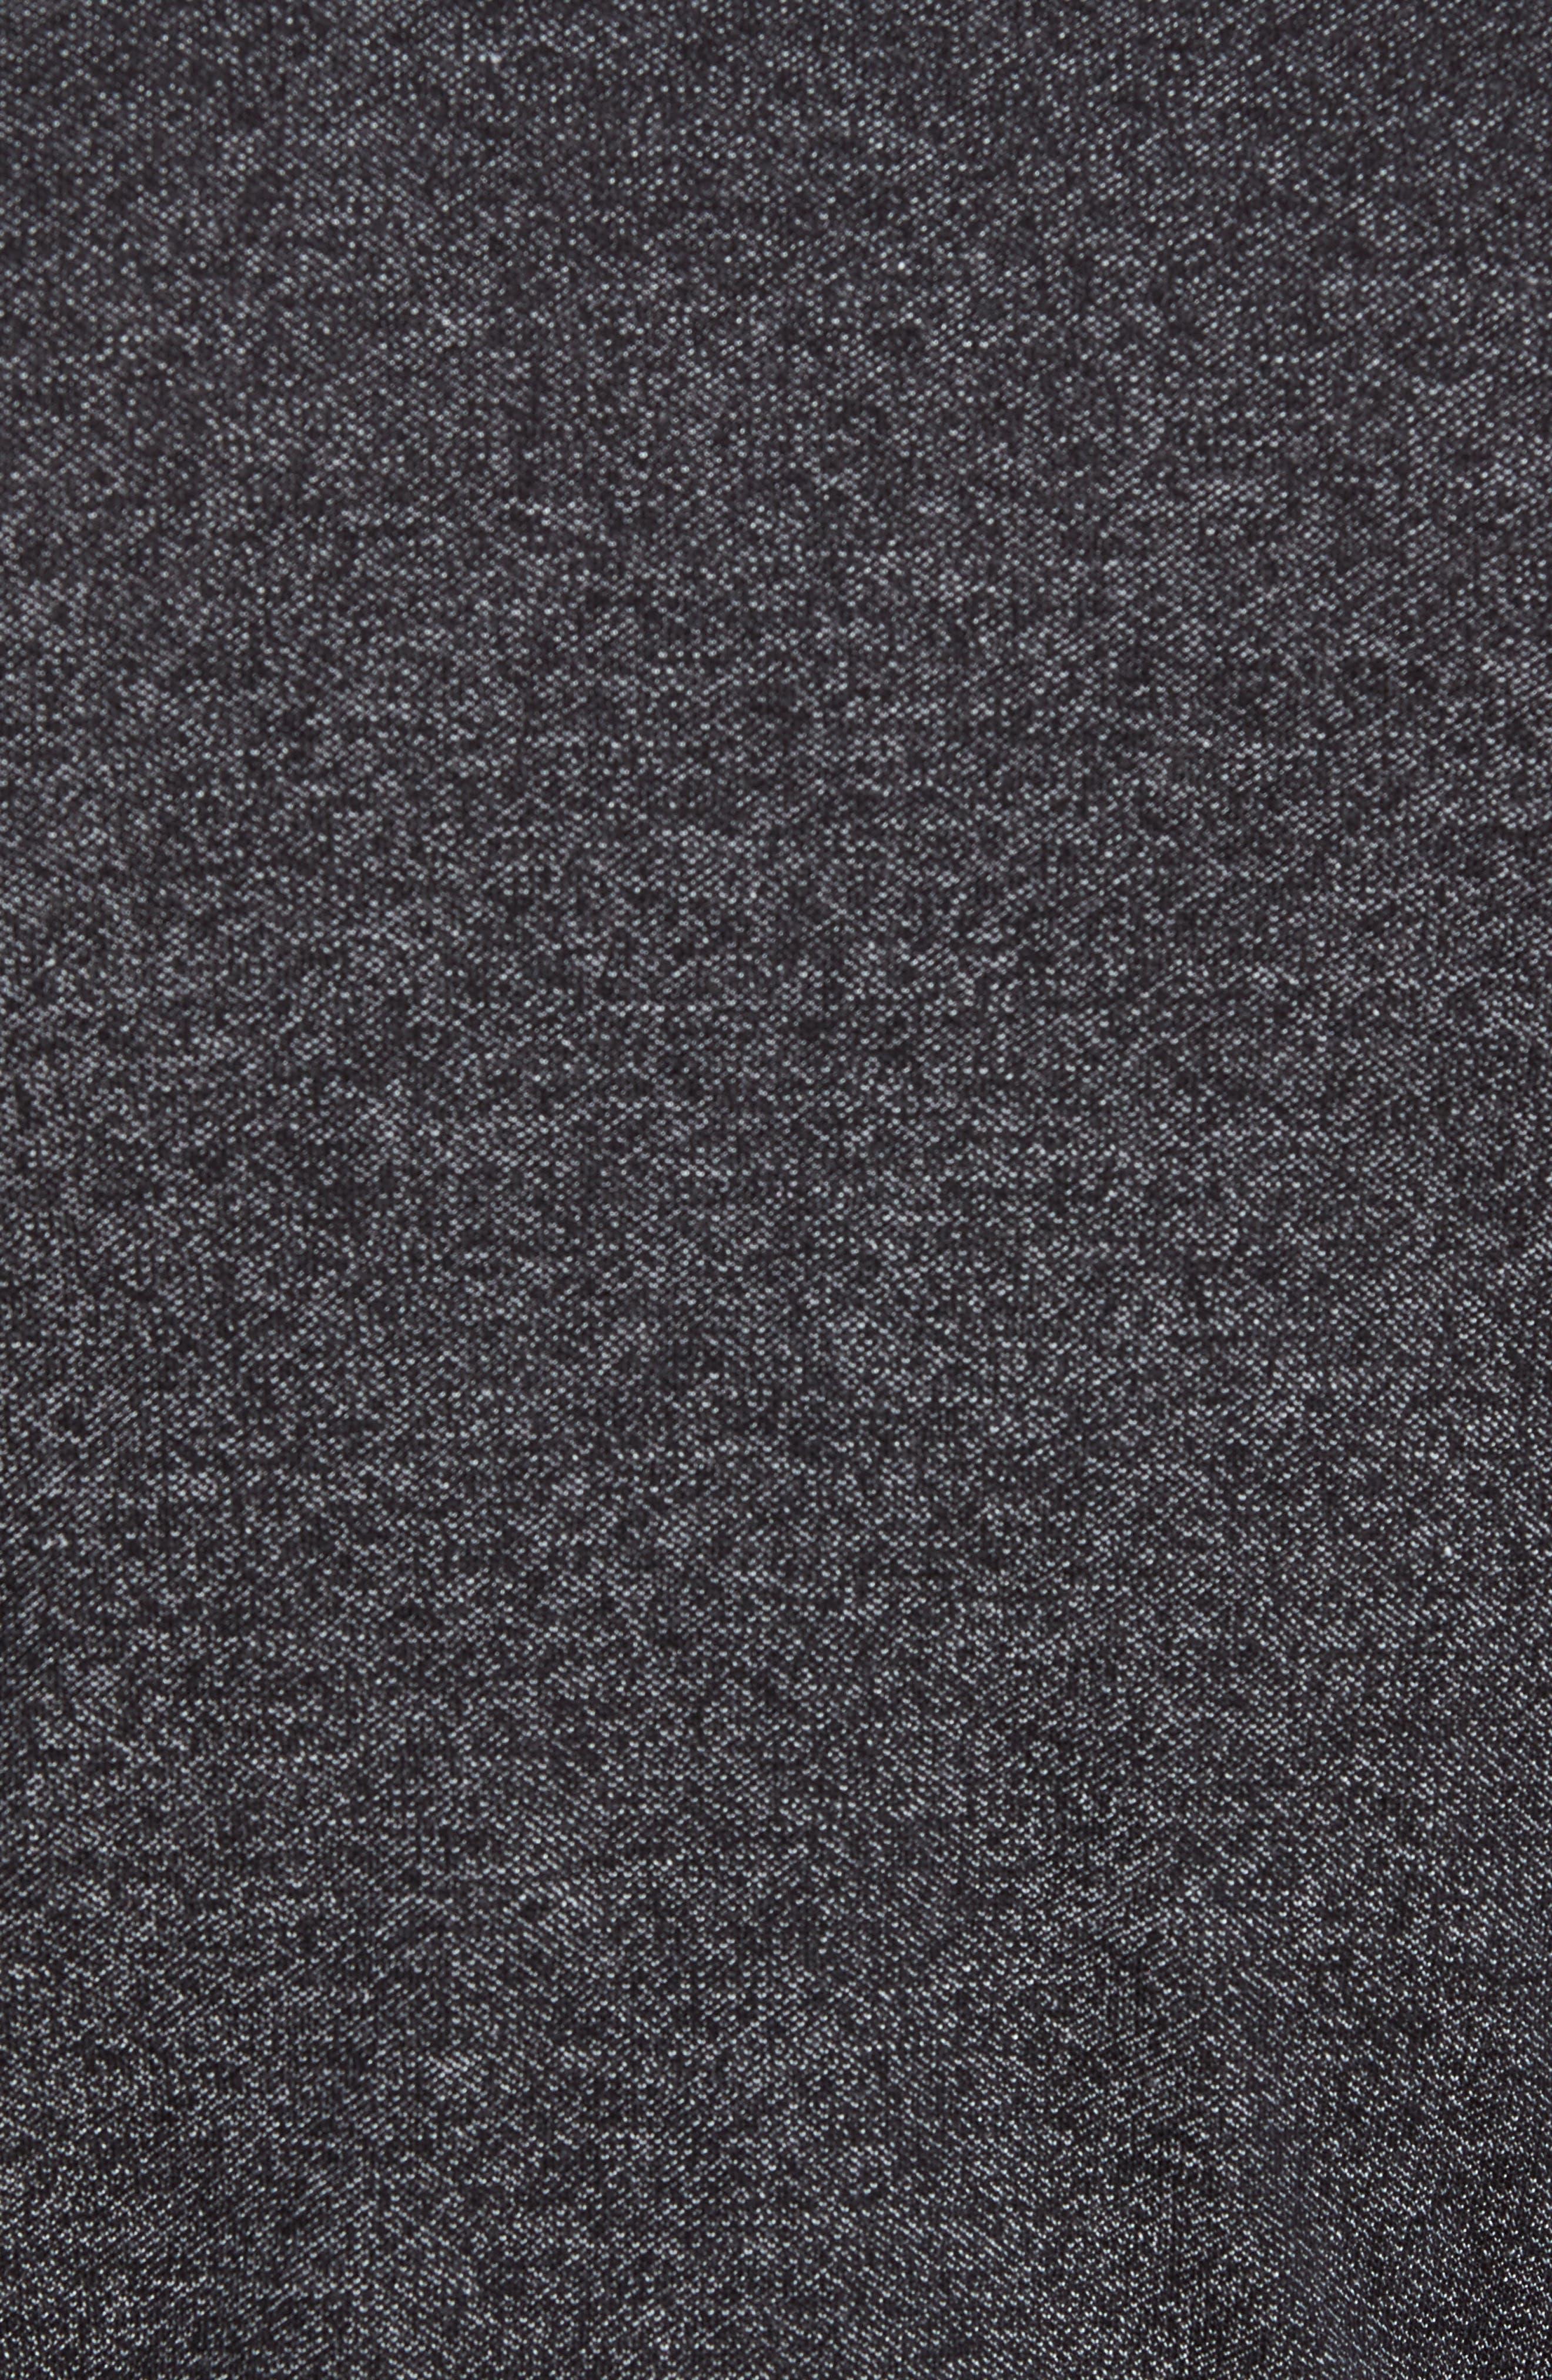 Chella Trim Fit Long Sleeve Polo,                             Alternate thumbnail 5, color,                             010